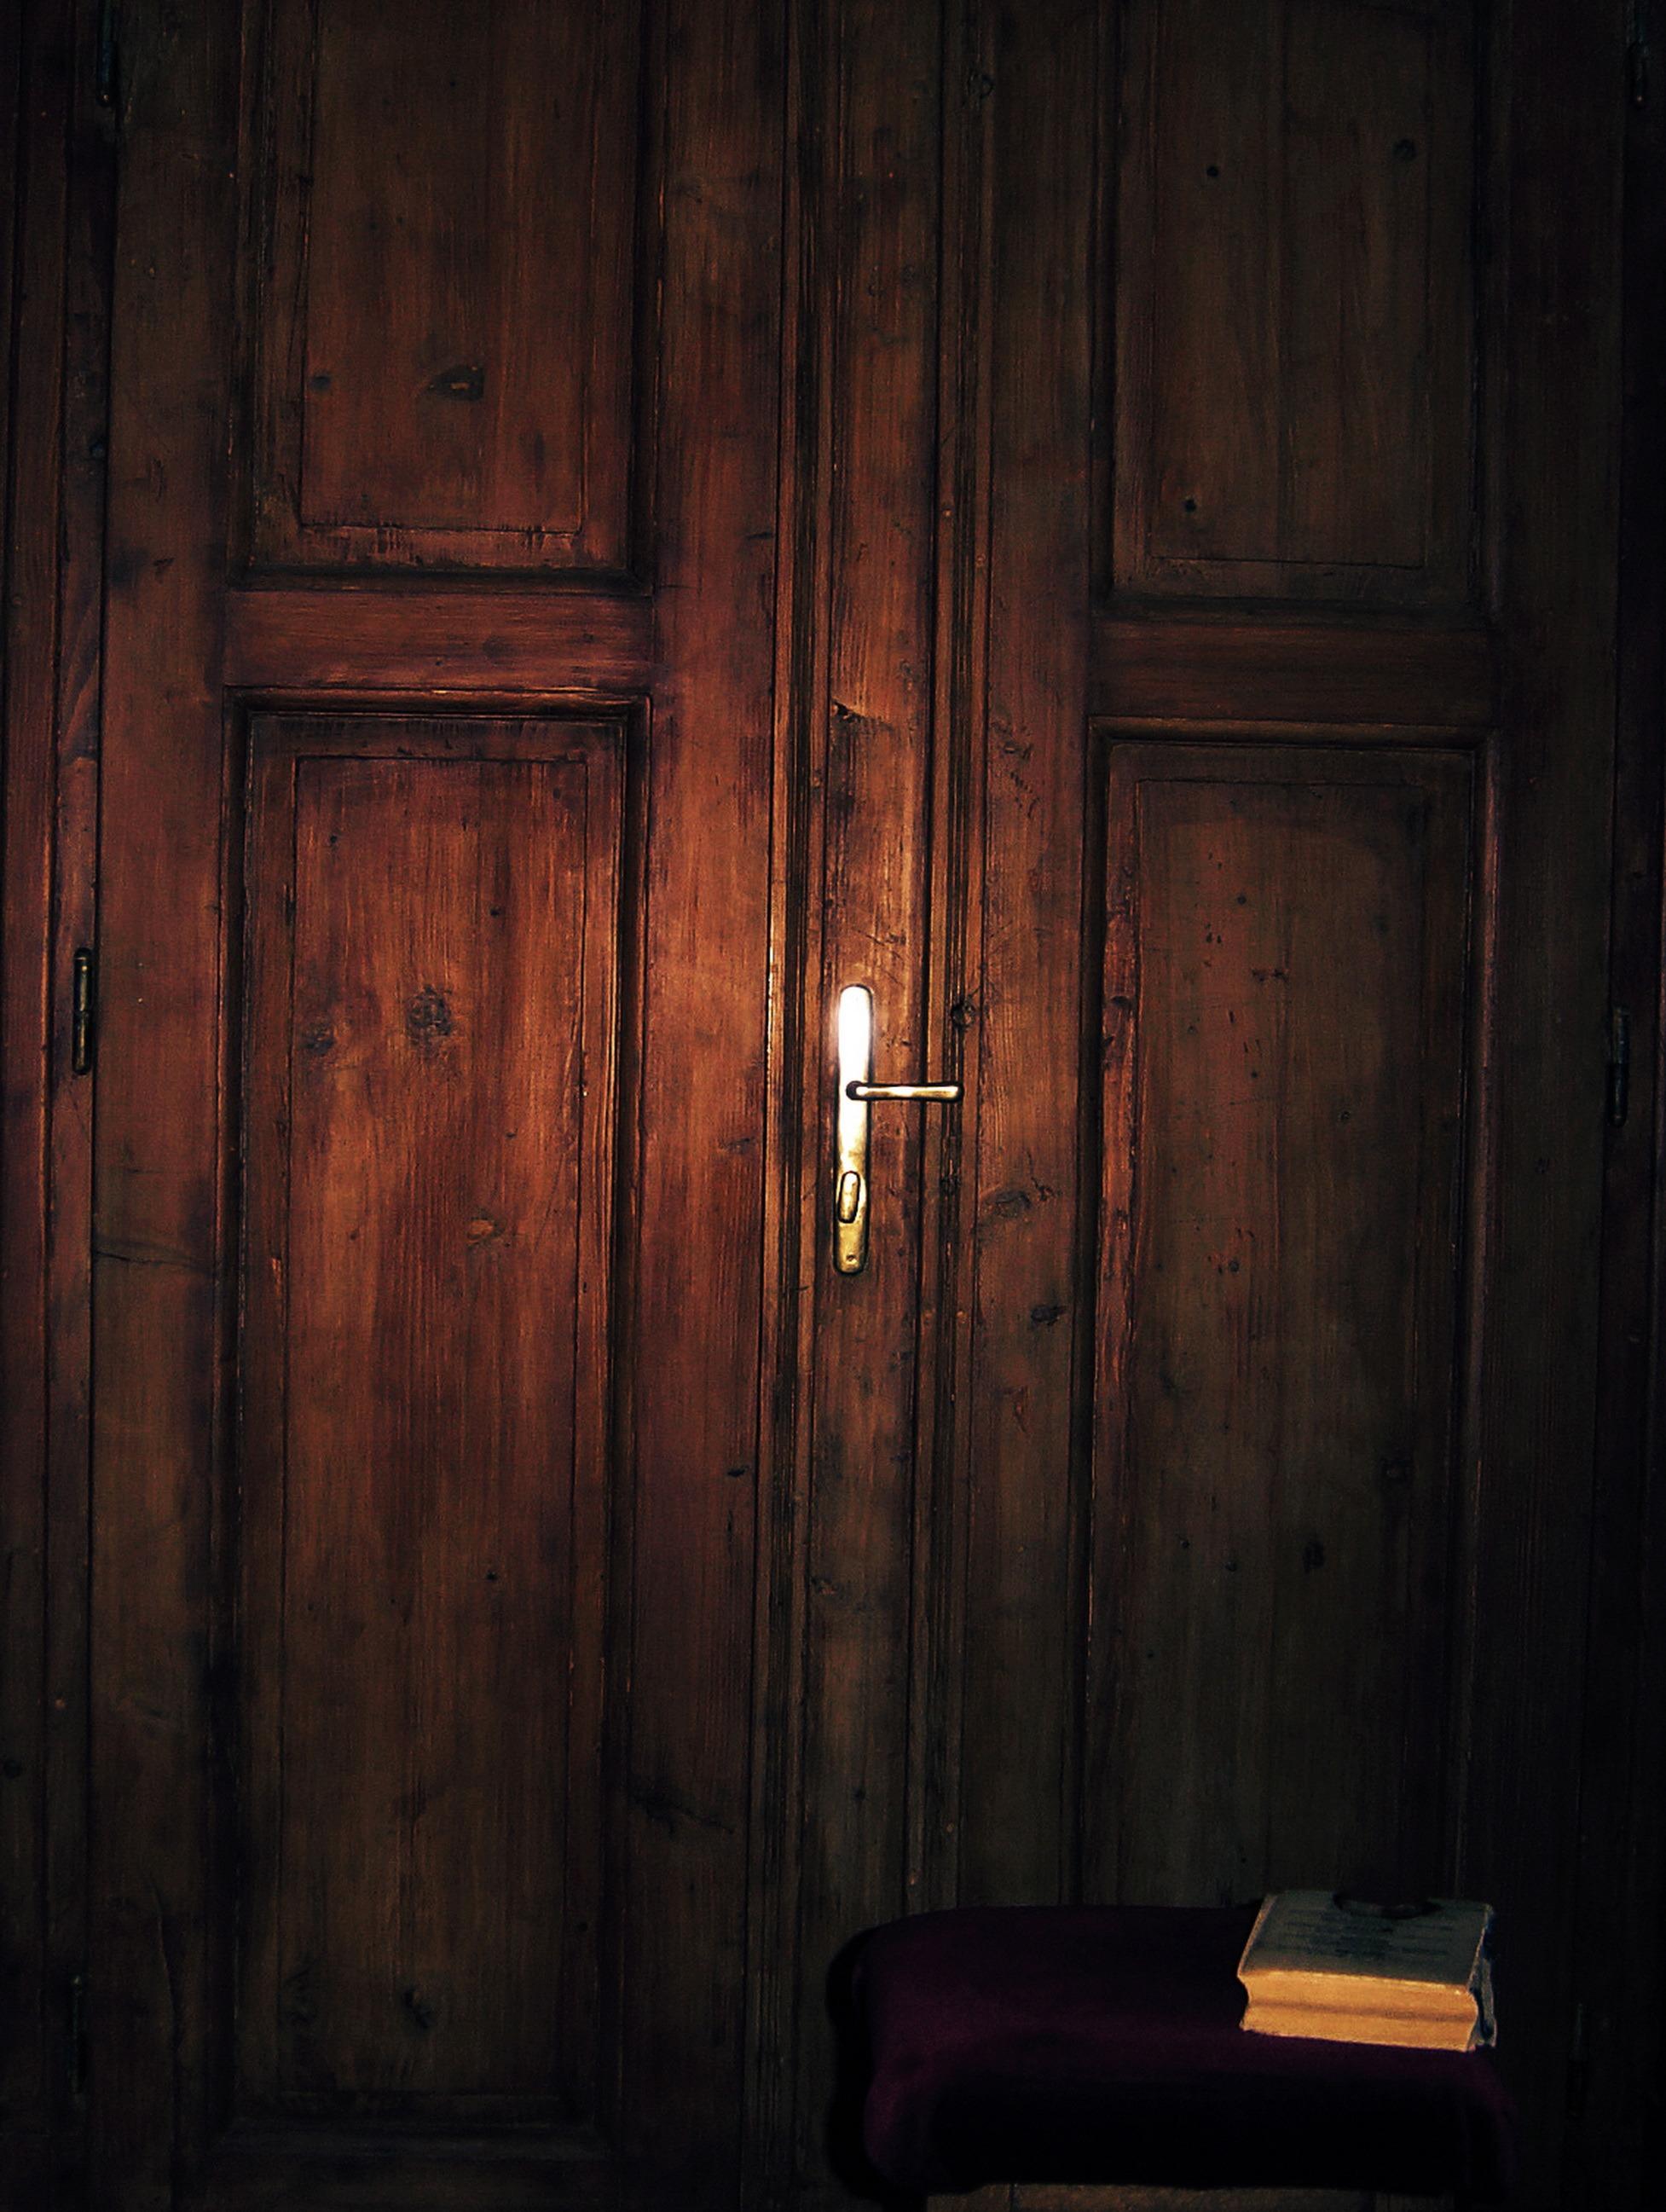 Light wood house texture floor old wall rustic entrance darkness furniture lighting door interior design inside